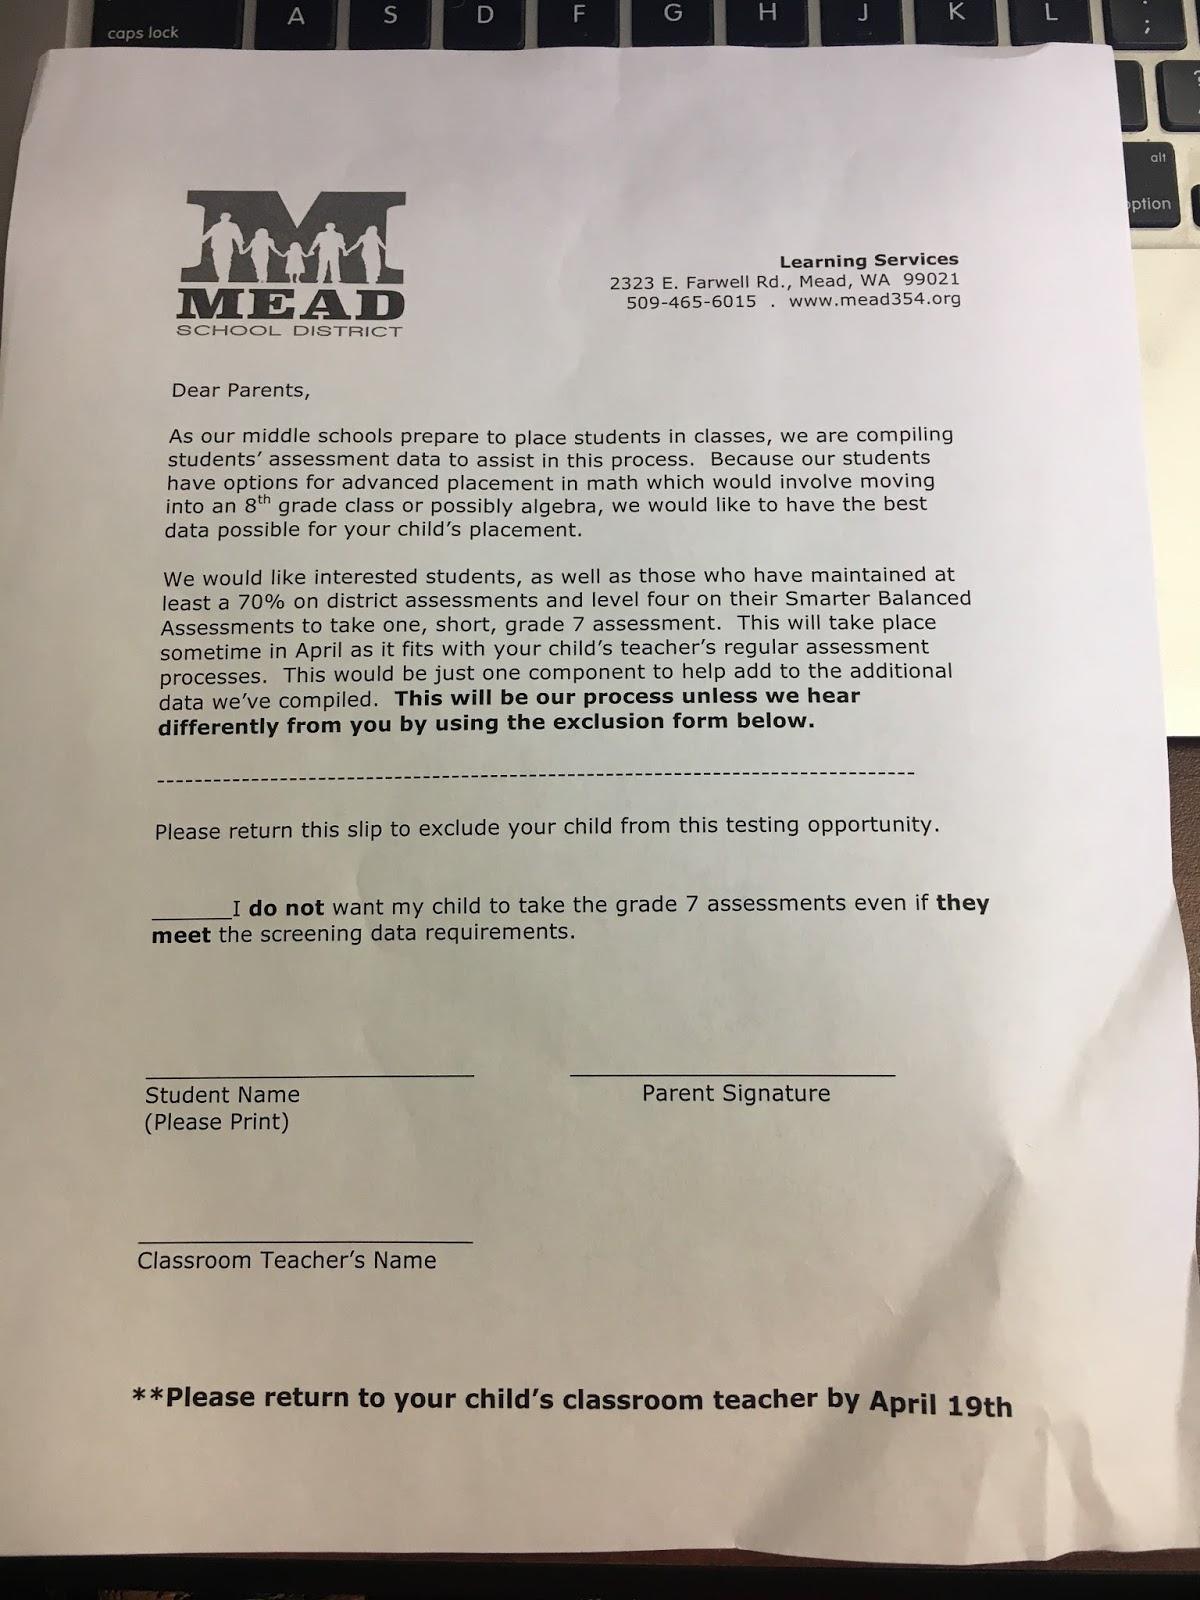 Prairiewood 6th Grade : Exclusion Form for 7th grade Advanced Math ...